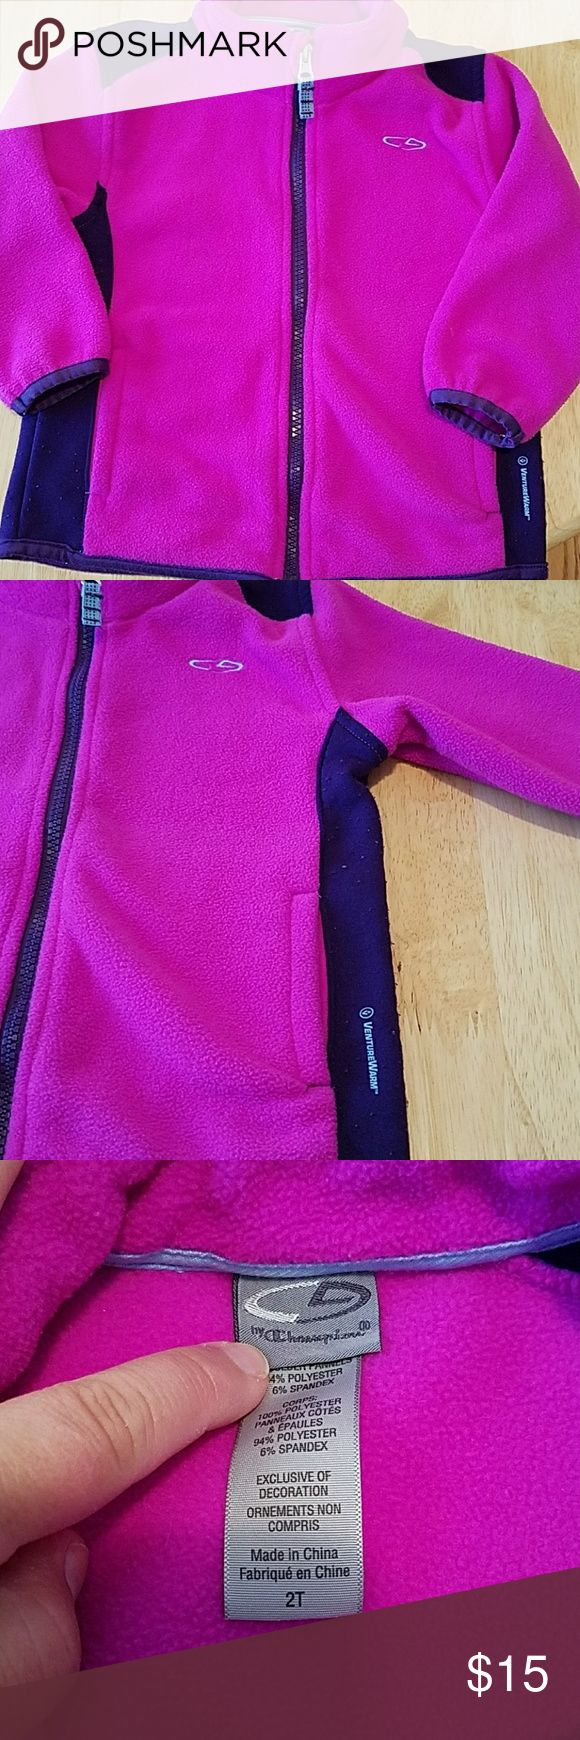 Champion Fleece jacket Fushia and purple zip up jacket Champion Jackets & Coats